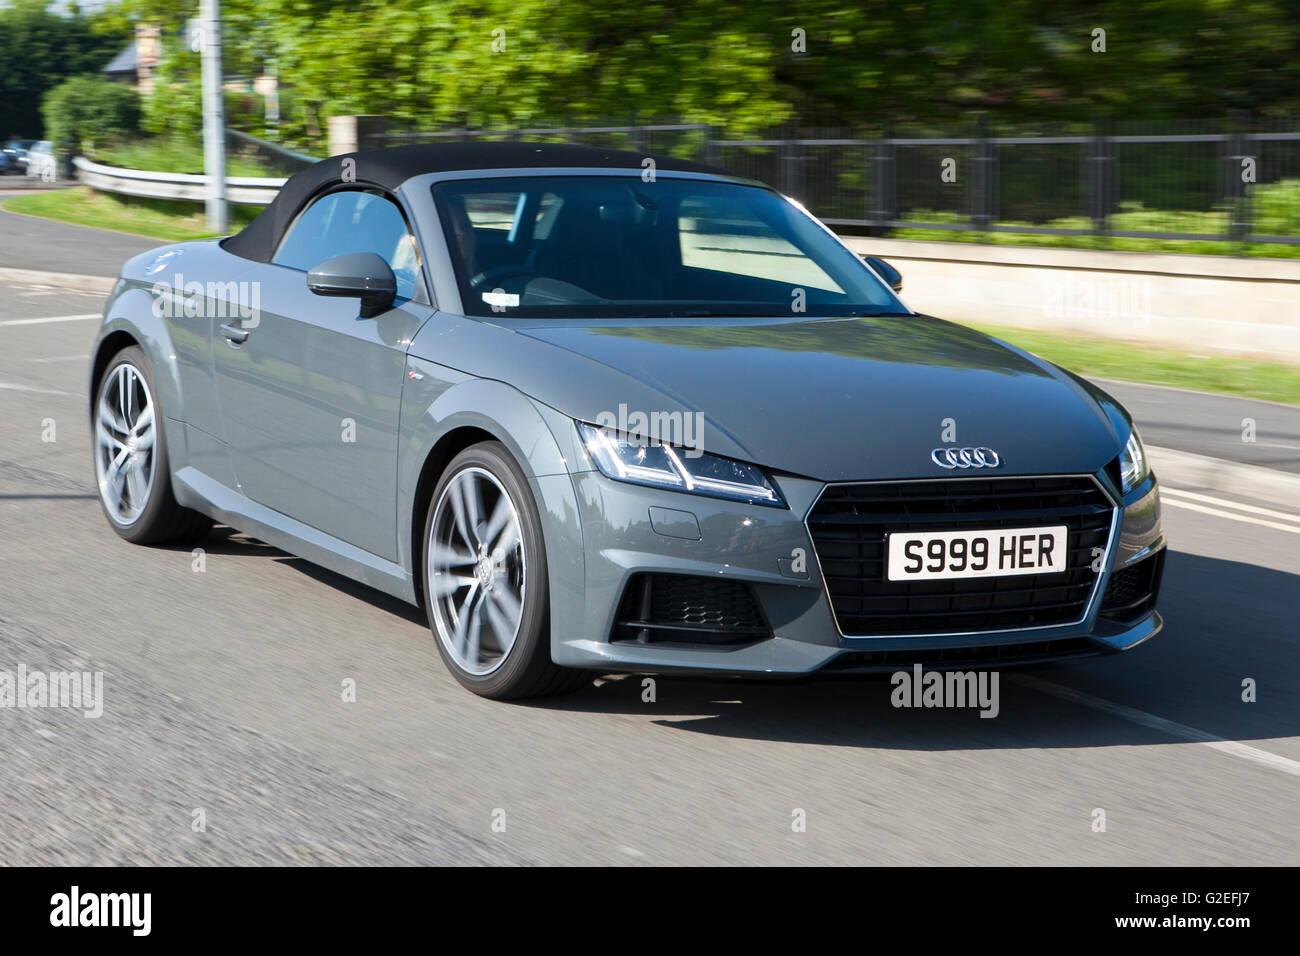 Audi, Tt, Classic, 2 Seater, Sports, Car, Pendle, Lancashire